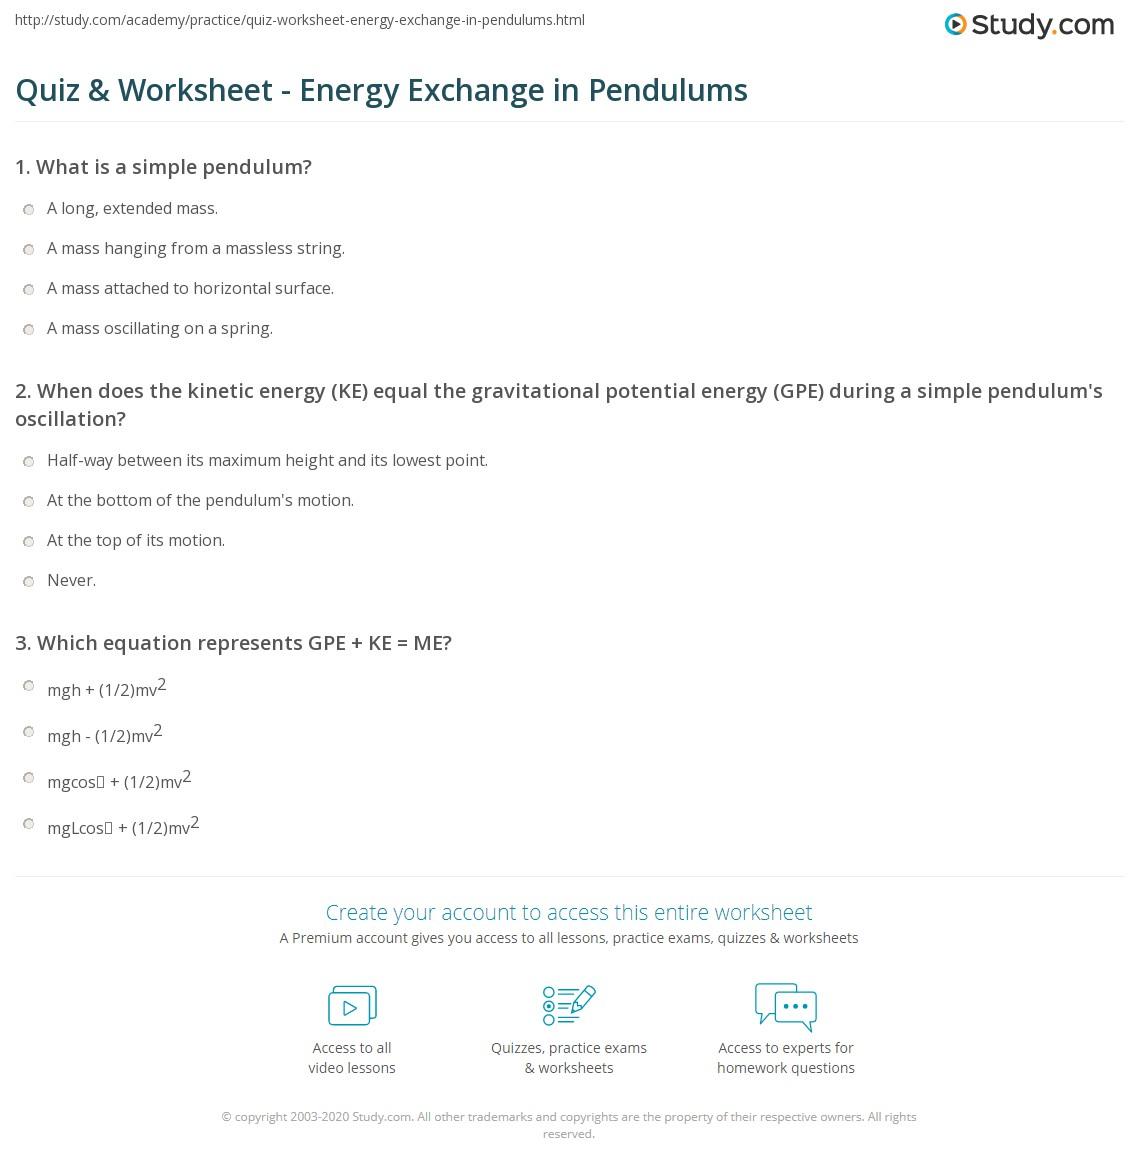 quiz worksheet energy exchange in pendulums. Black Bedroom Furniture Sets. Home Design Ideas